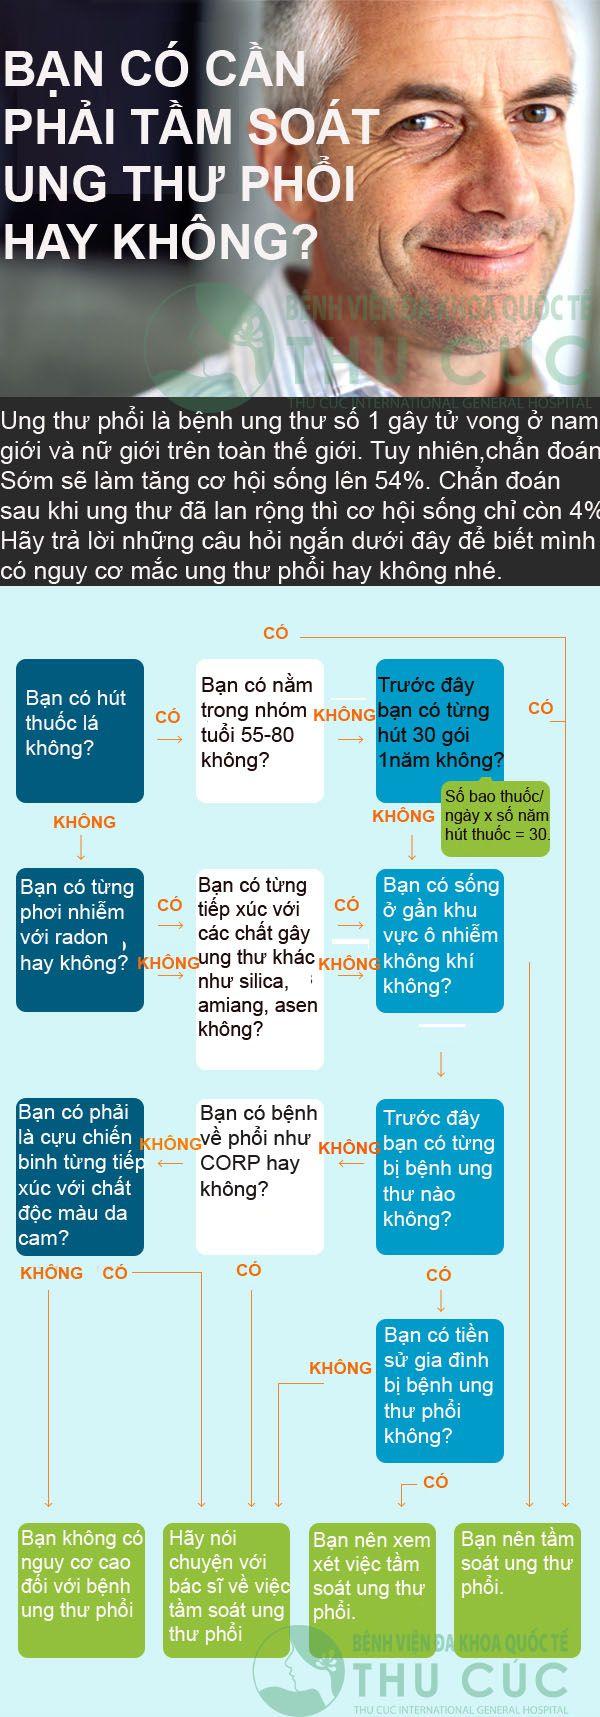 co-nen-tam-soat-ung-thu-phoi-khong1